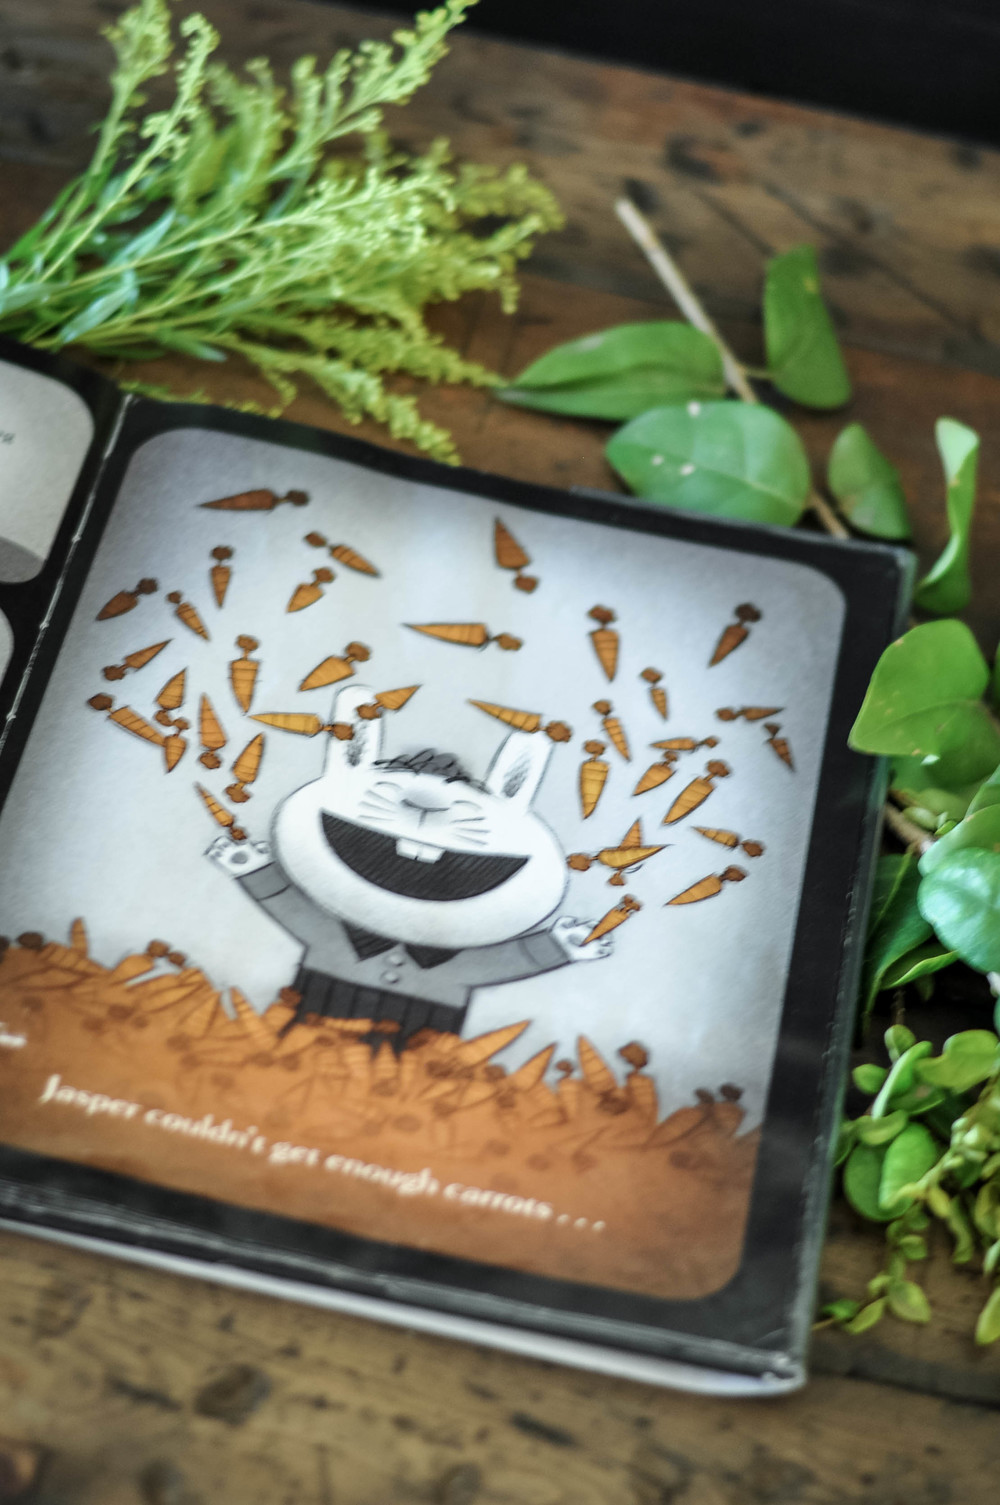 Creepy Carrots Book Review